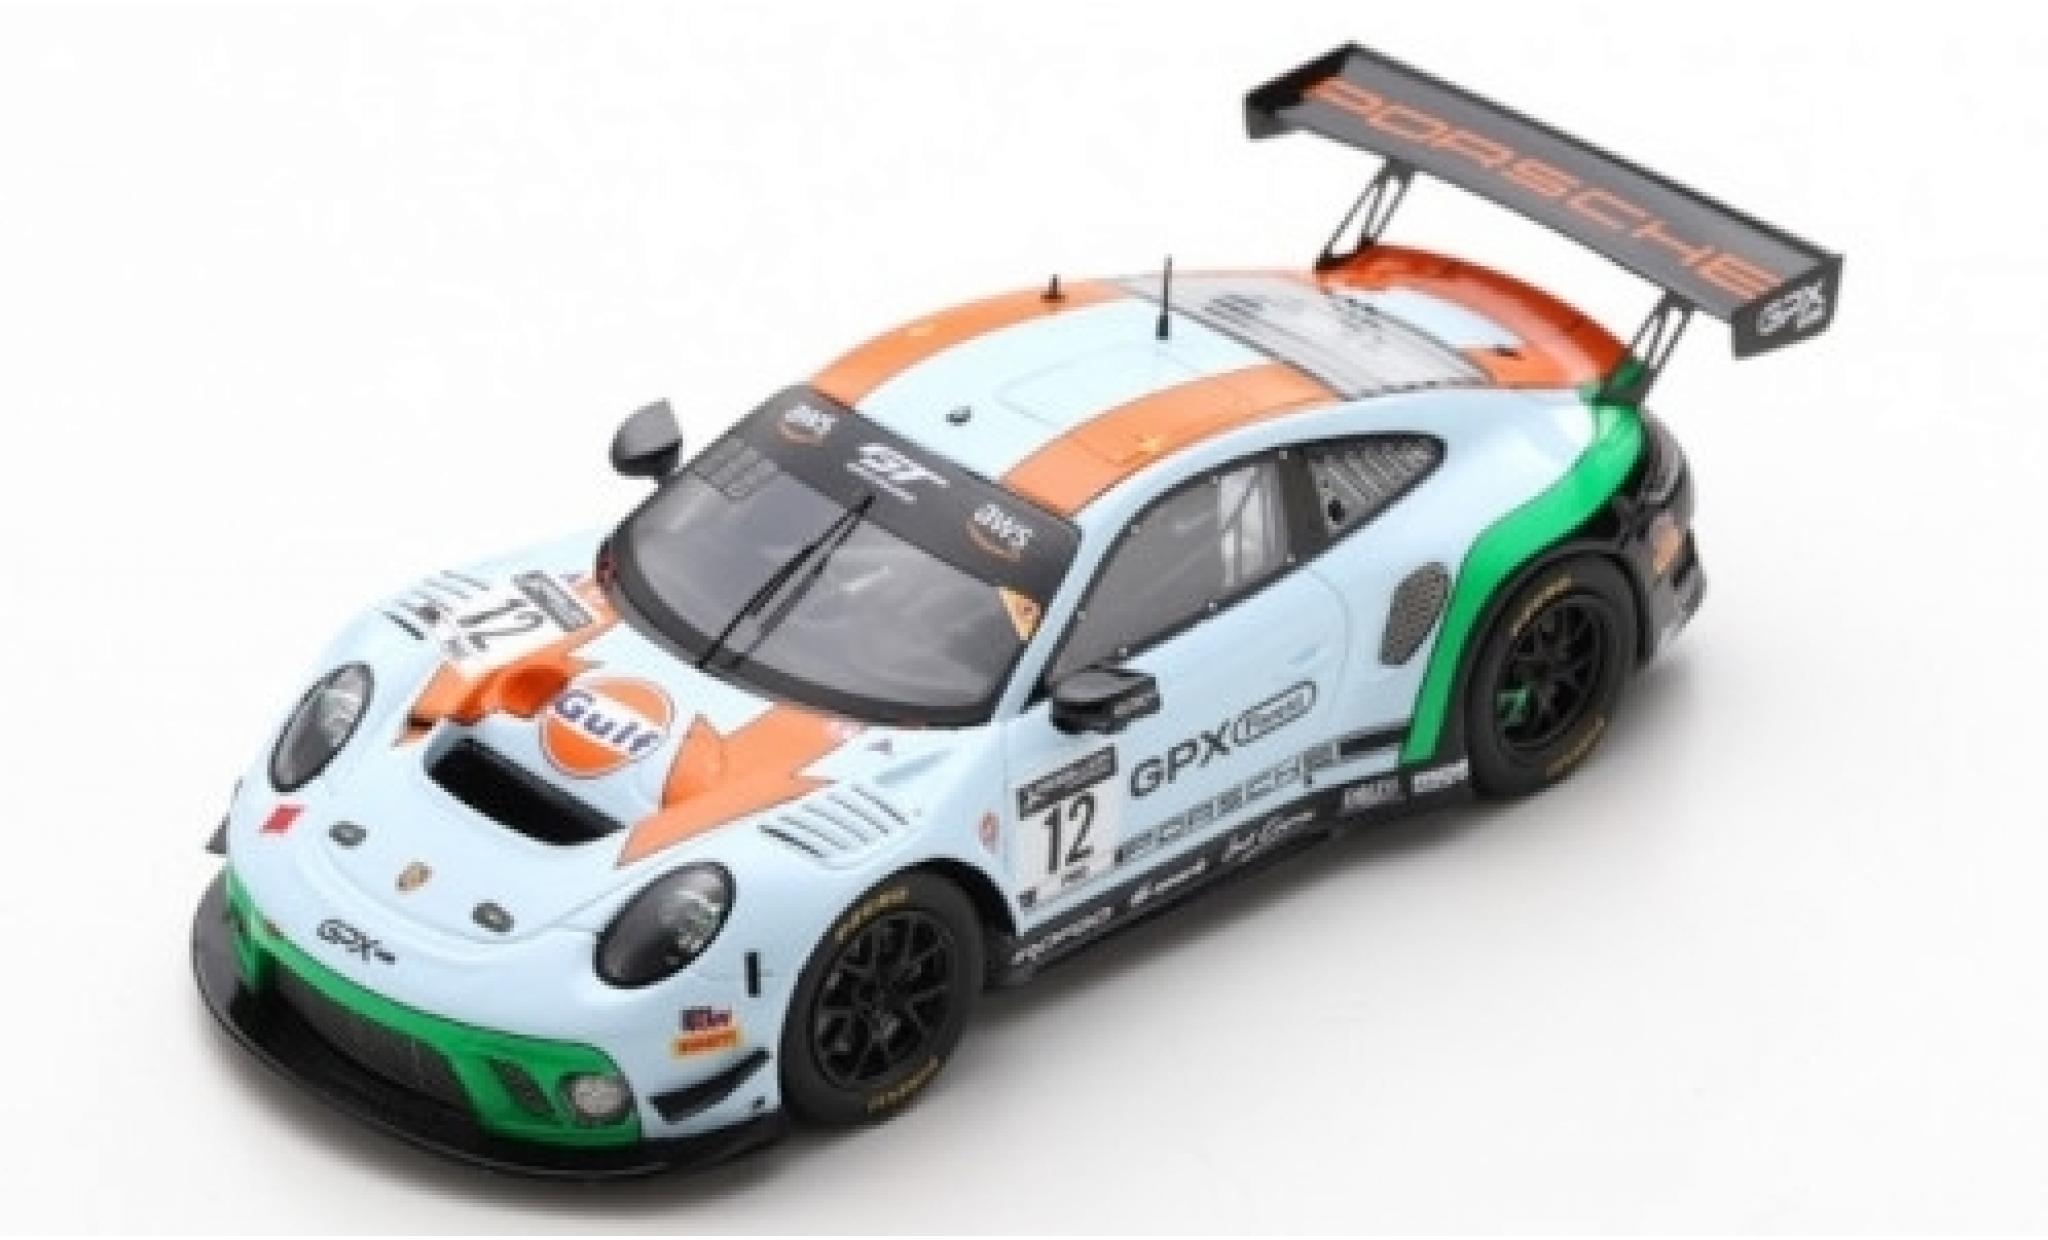 Porsche 992 GT3 R 1/43 Spark 911 (991.2) No.12 GPX Racing Gulf 2019 The Diamond